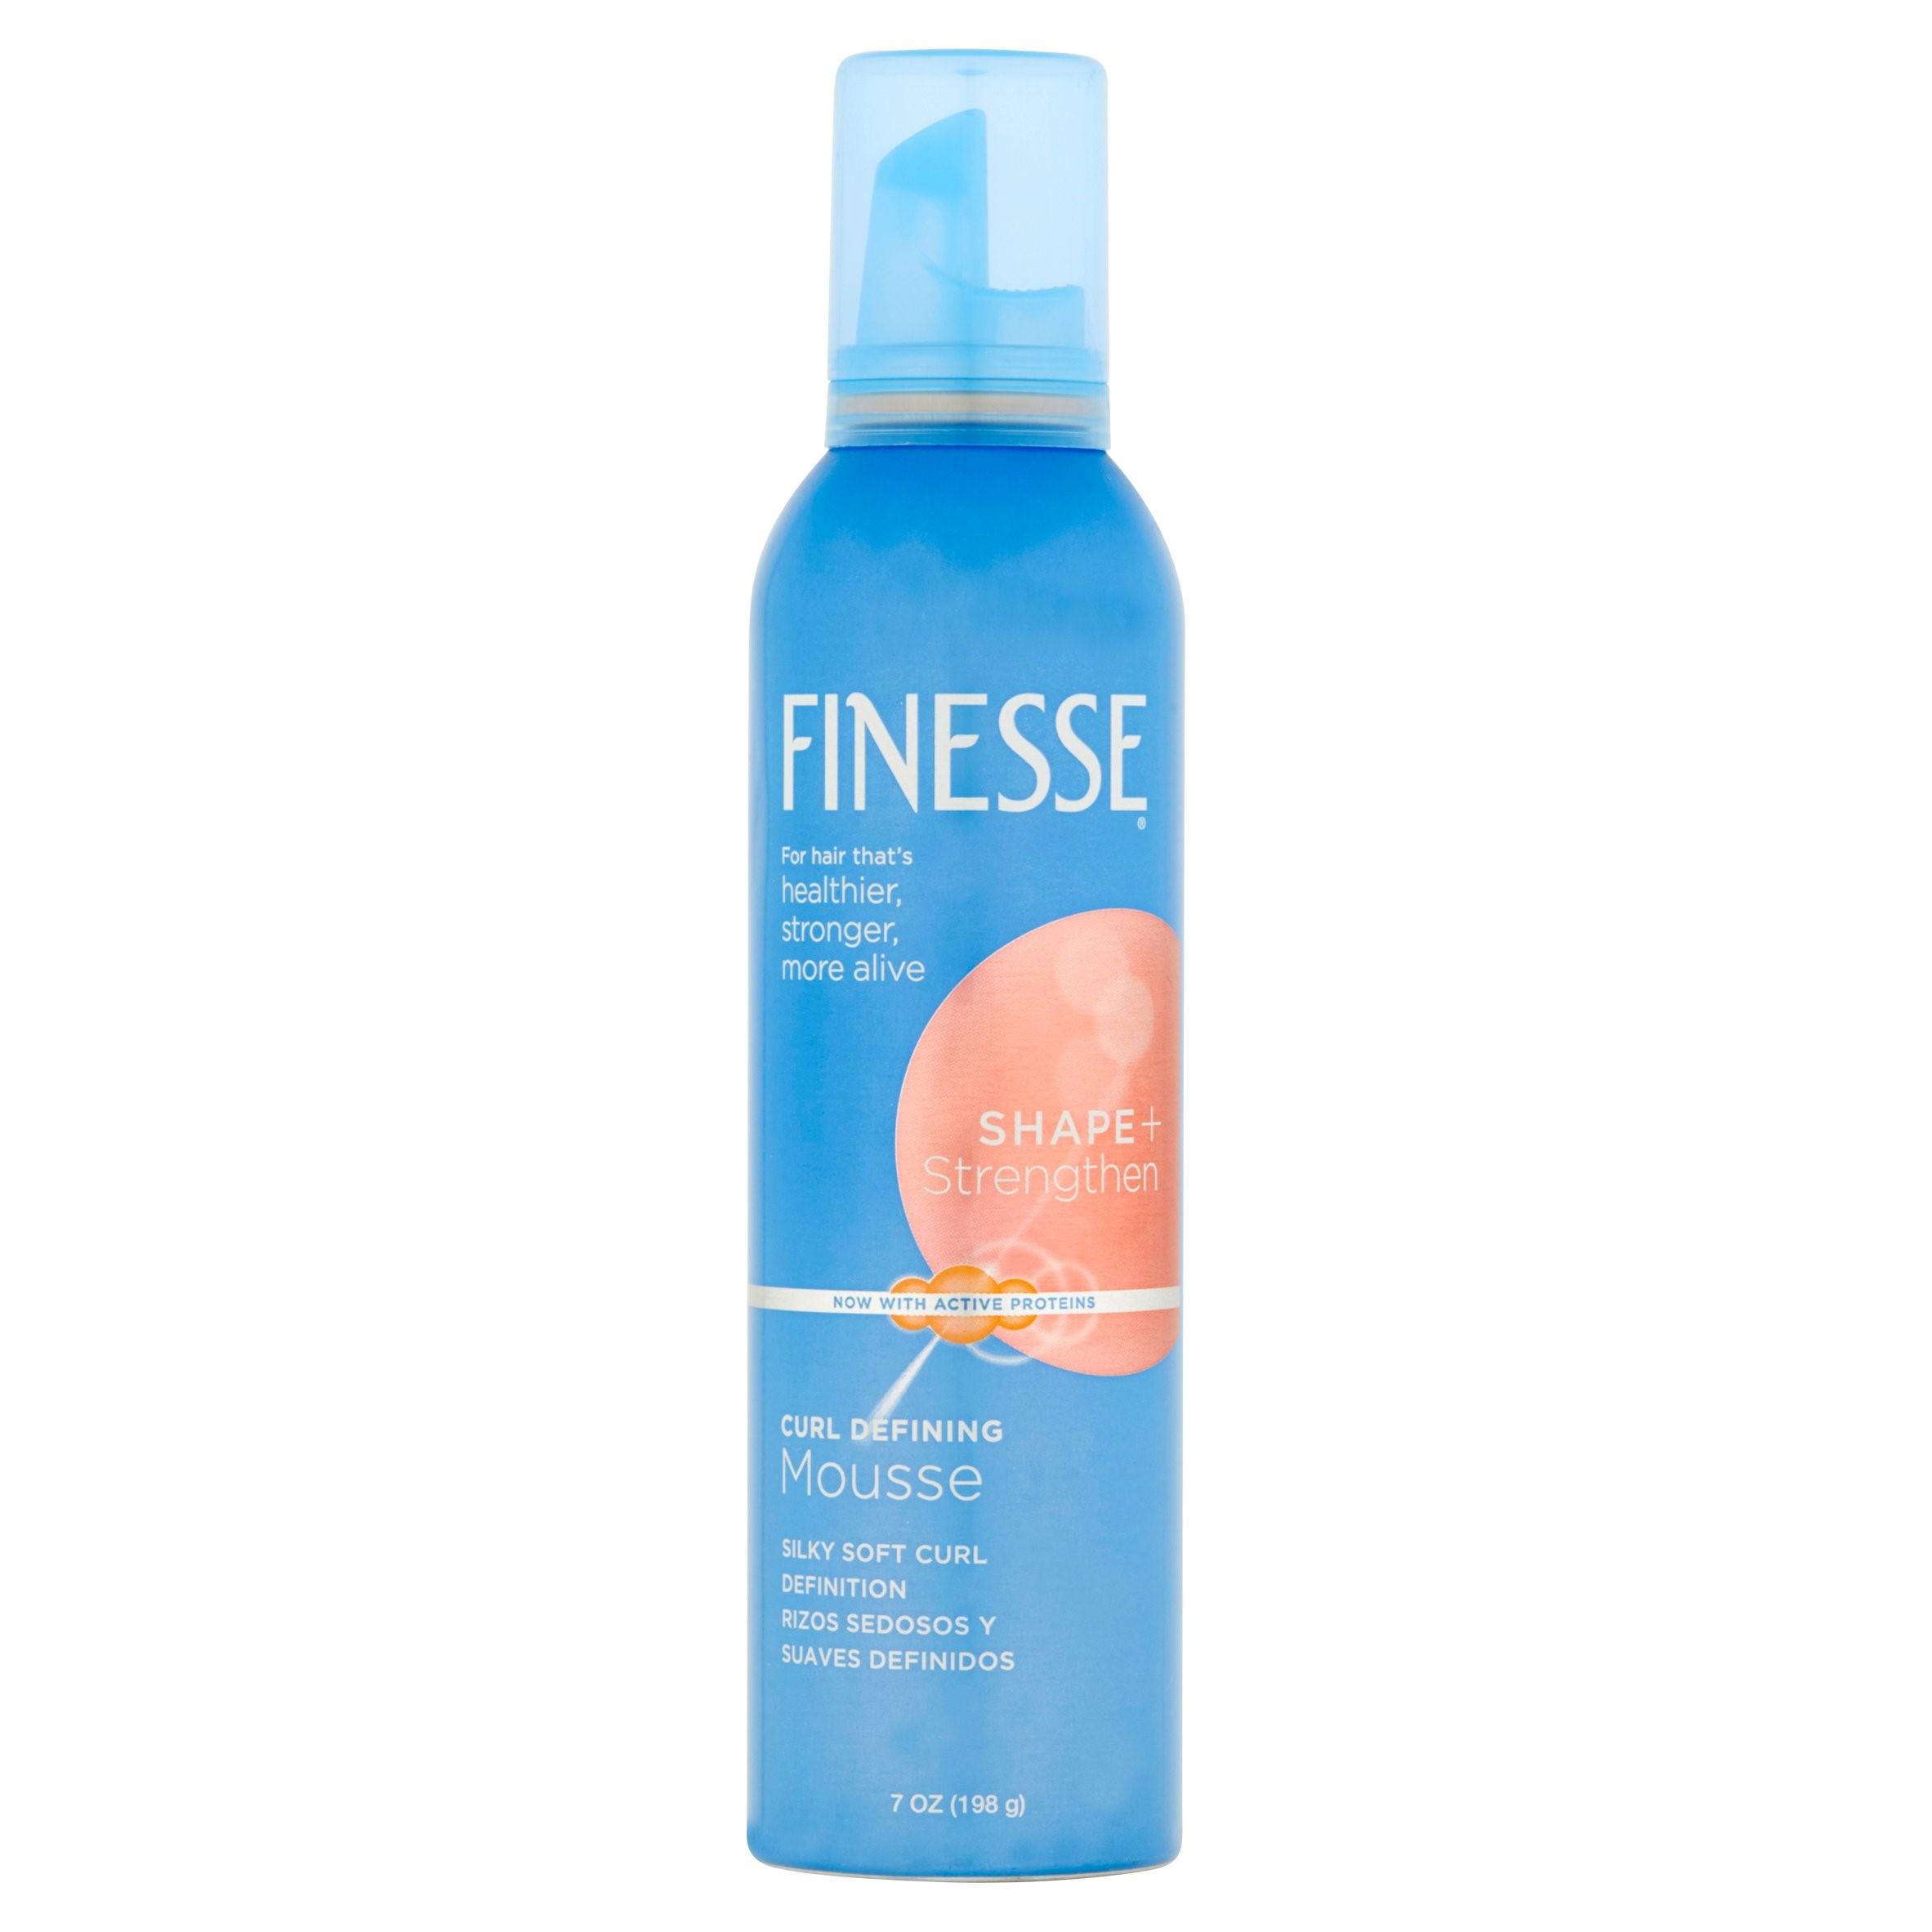 Finesse Shape + Strengthen Curl Defining Mousse, 7 Oz